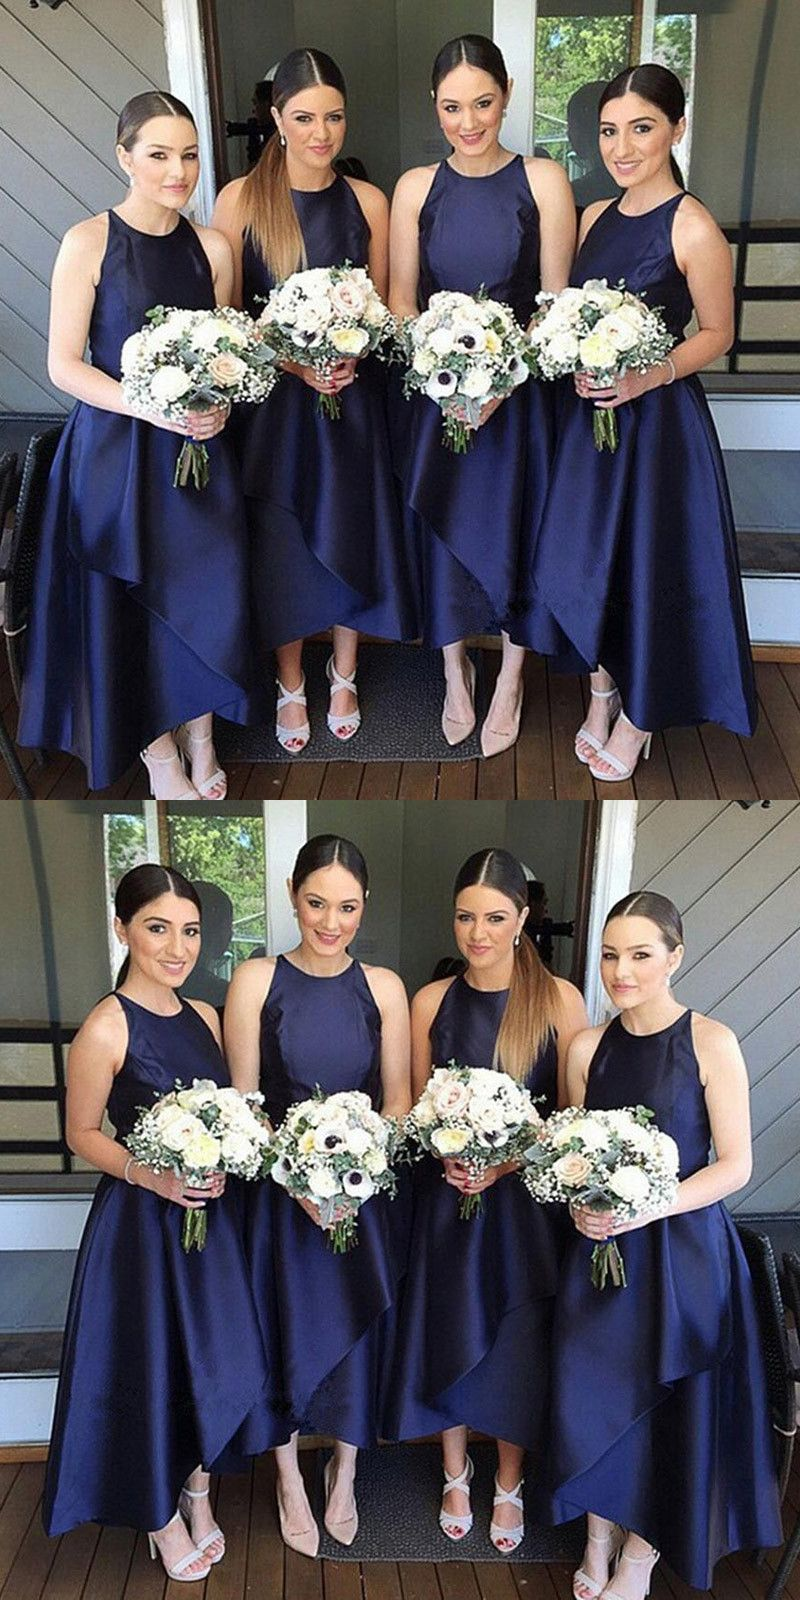 b37d21e2ad9 Simple A-Line Jewel Navy Blue Satin Ankle Length Bridesmaid Dresses ...